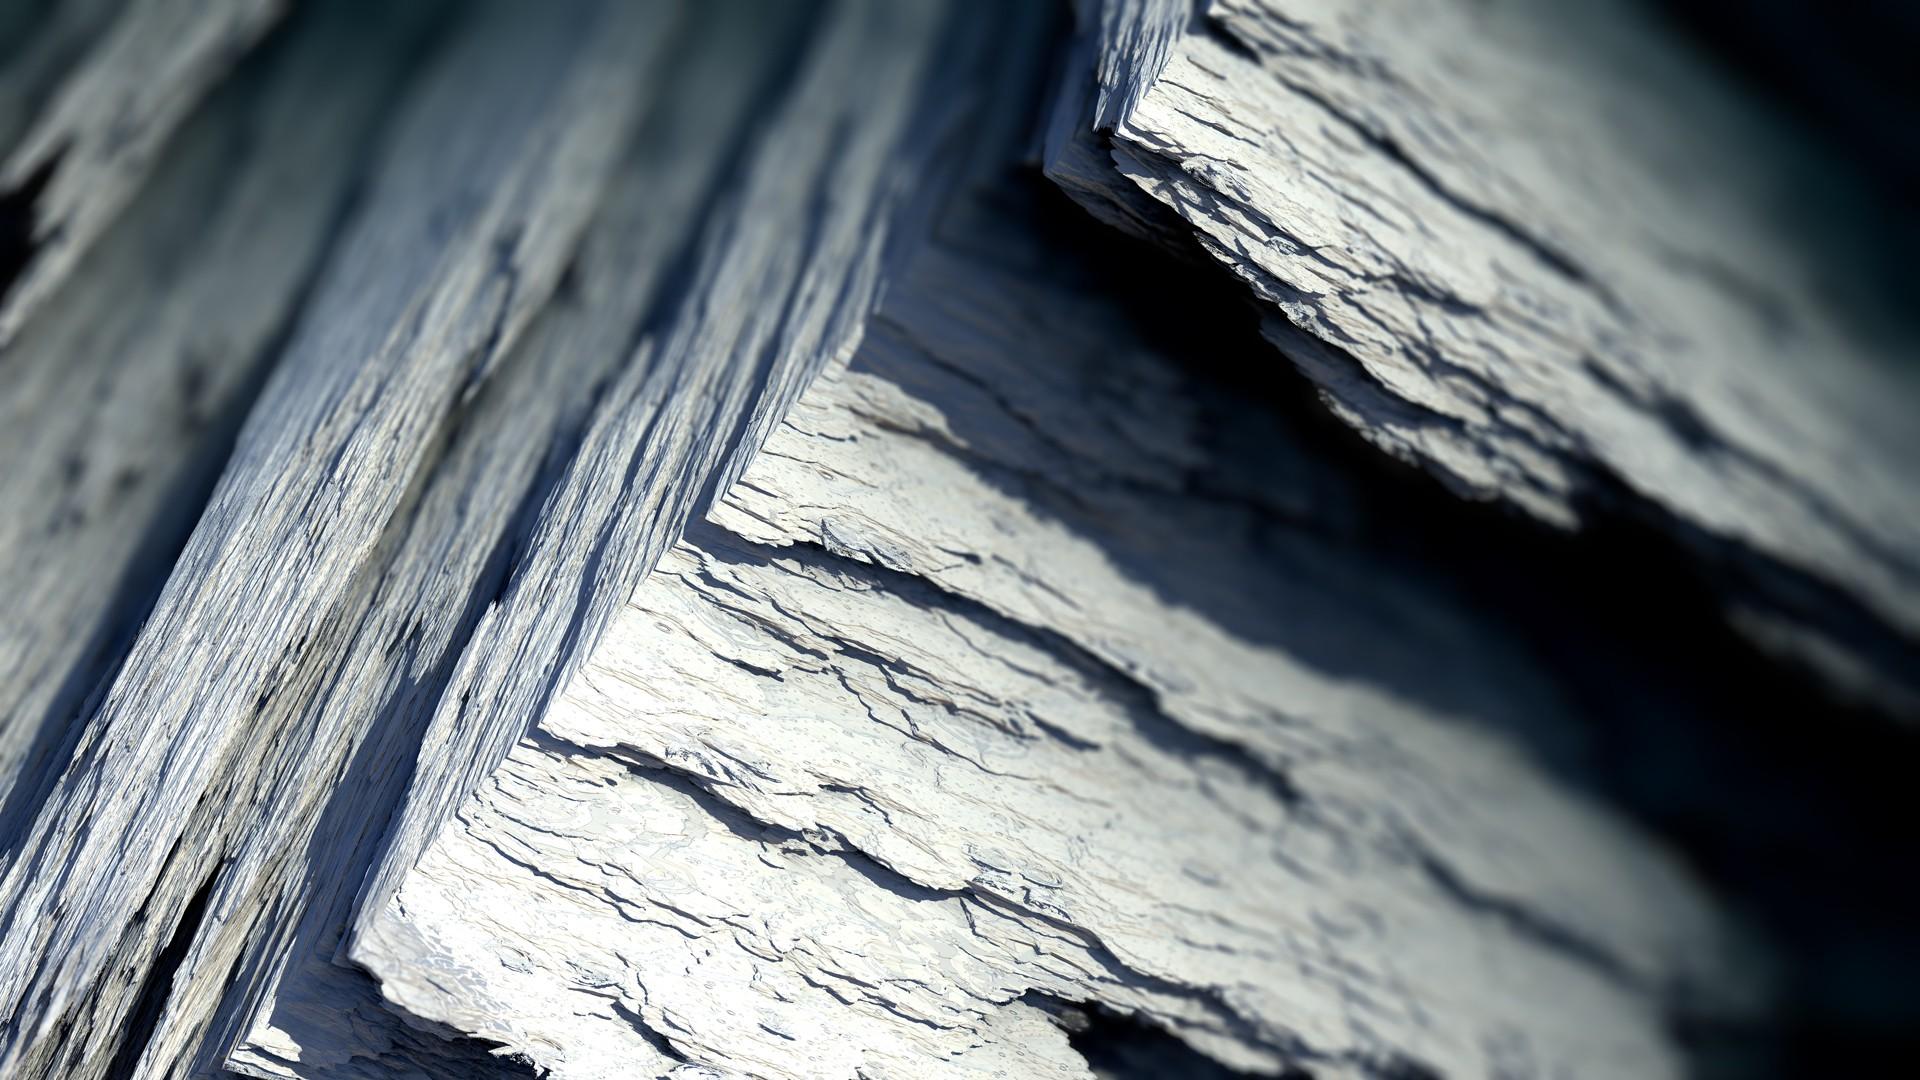 Wonderful Wallpapers Hd 12 Wonderful Hd Mineral Wallpapers